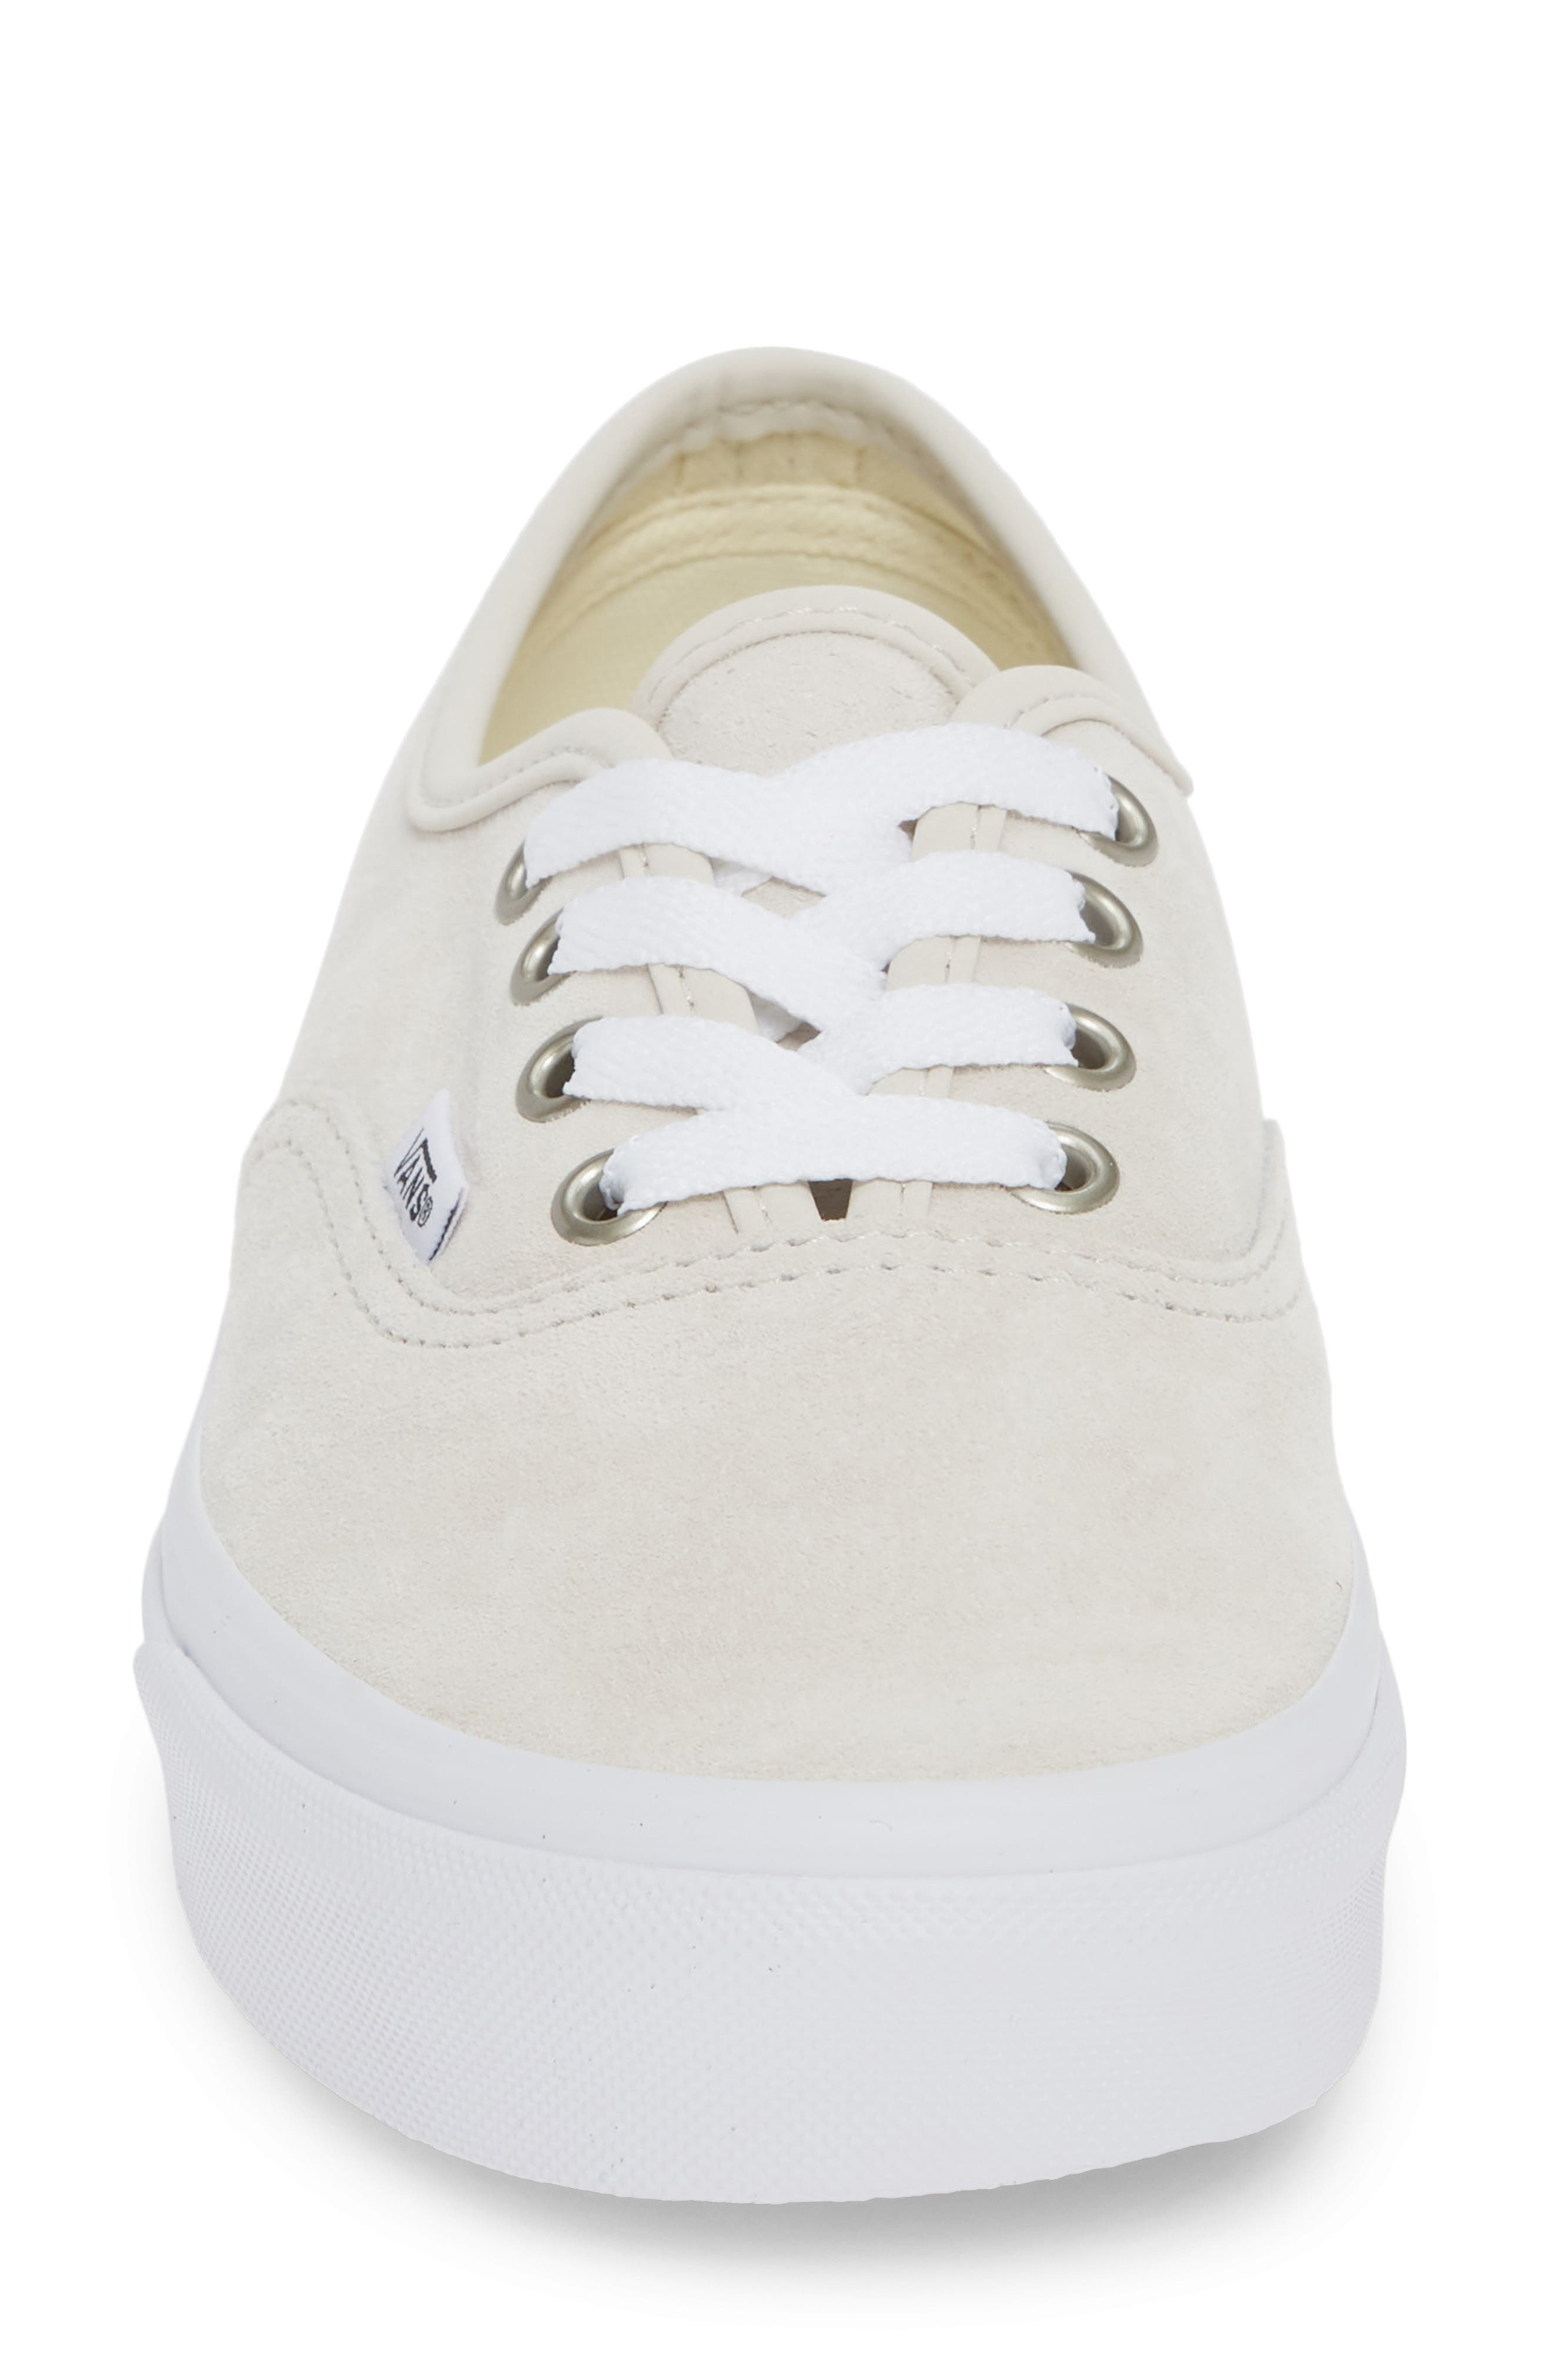 UA Authentic Sneaker,                             Alternate thumbnail 4, color,                             270